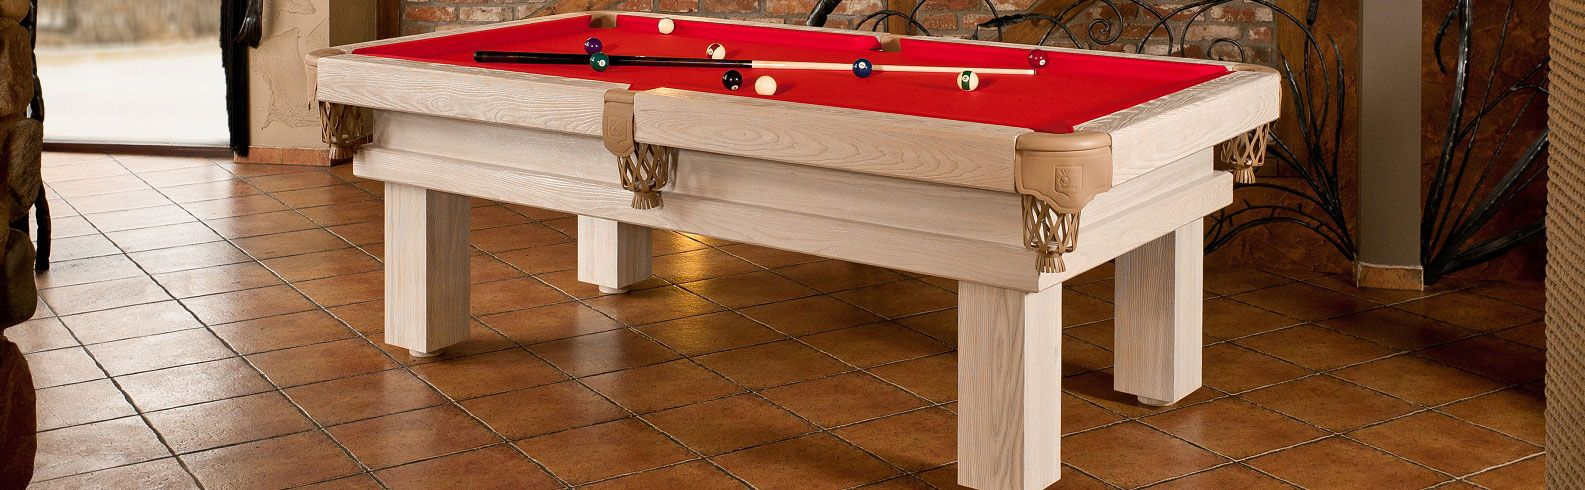 WwwLuxuryPoolTablescouk Luxury Pool Tables Bespoke Custom - Rustic modern pool table